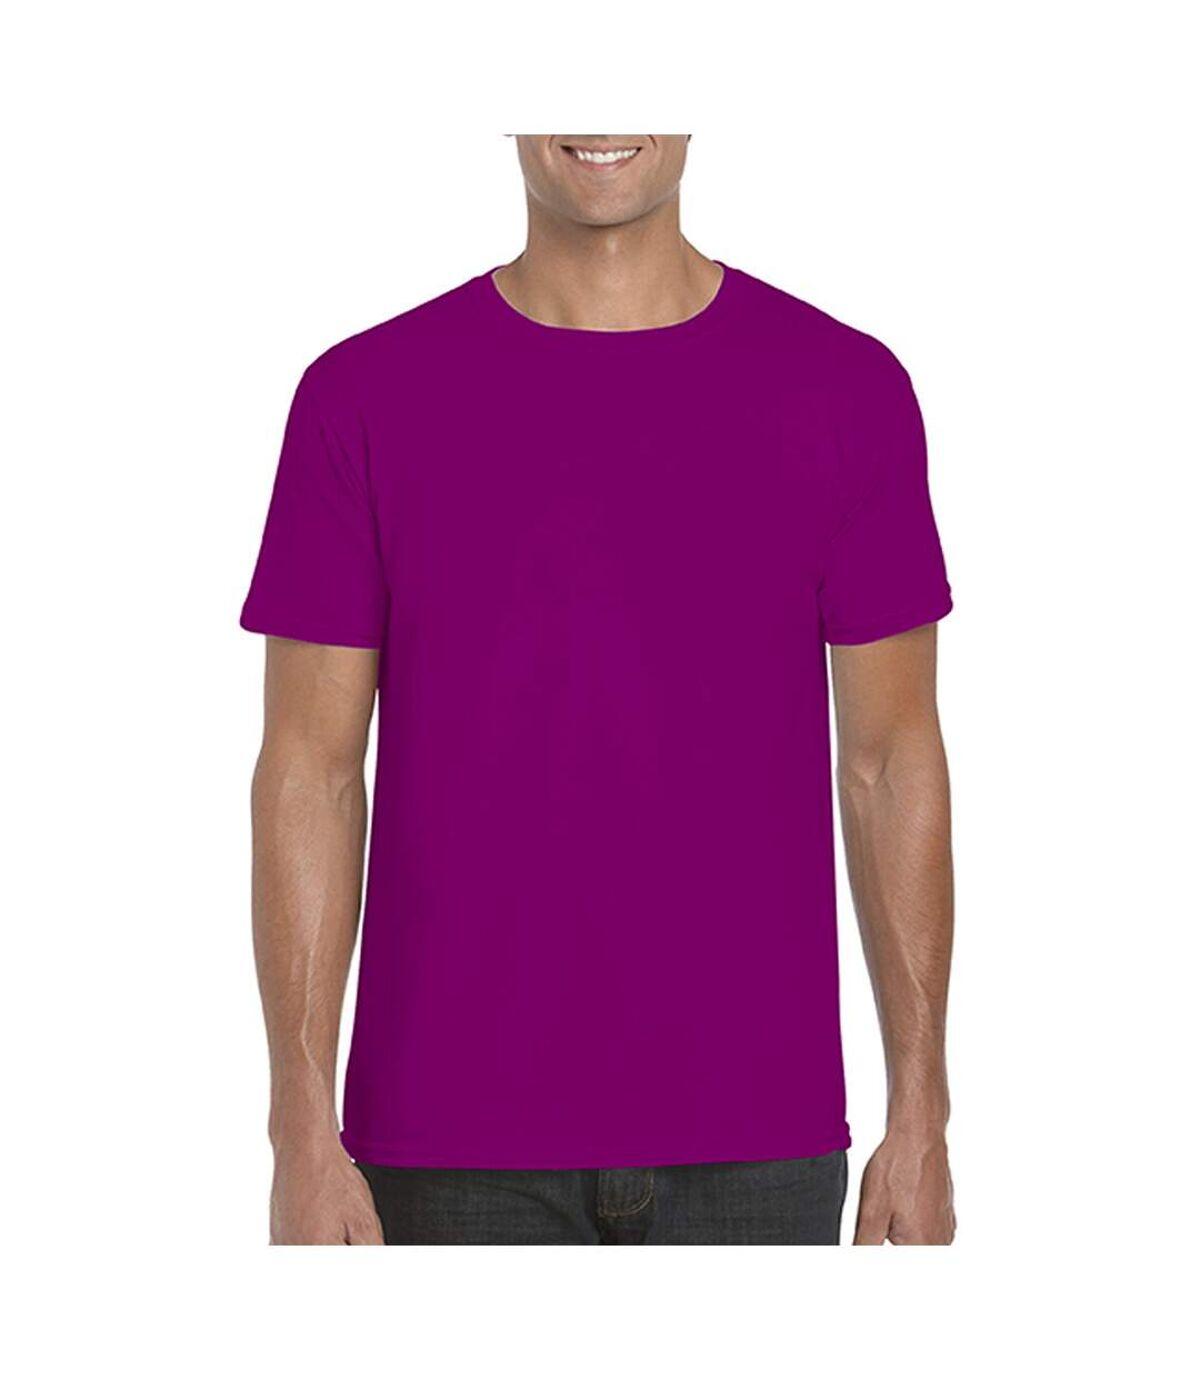 Gildan Mens Short Sleeve Soft-Style T-Shirt (Heather Navy) - UTBC484